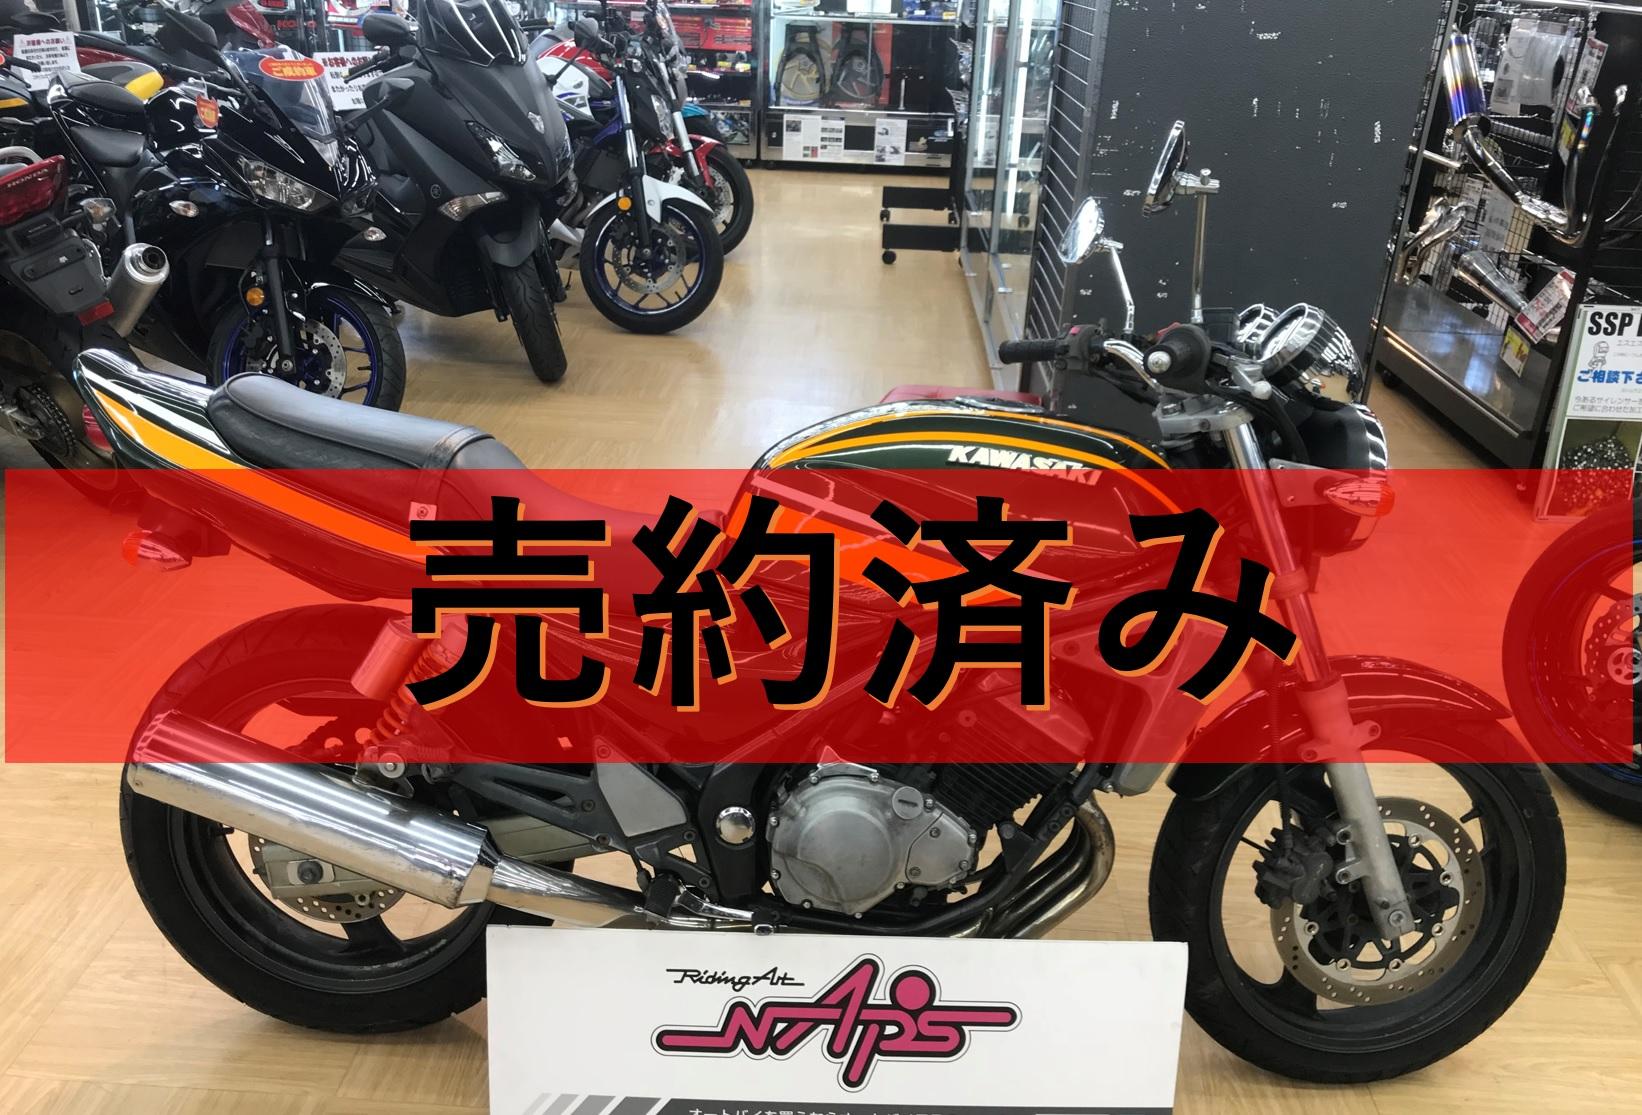 KAWASAKI 【販売車両】カワサキ バリオスⅡ カスタムペイント フェンダーカット